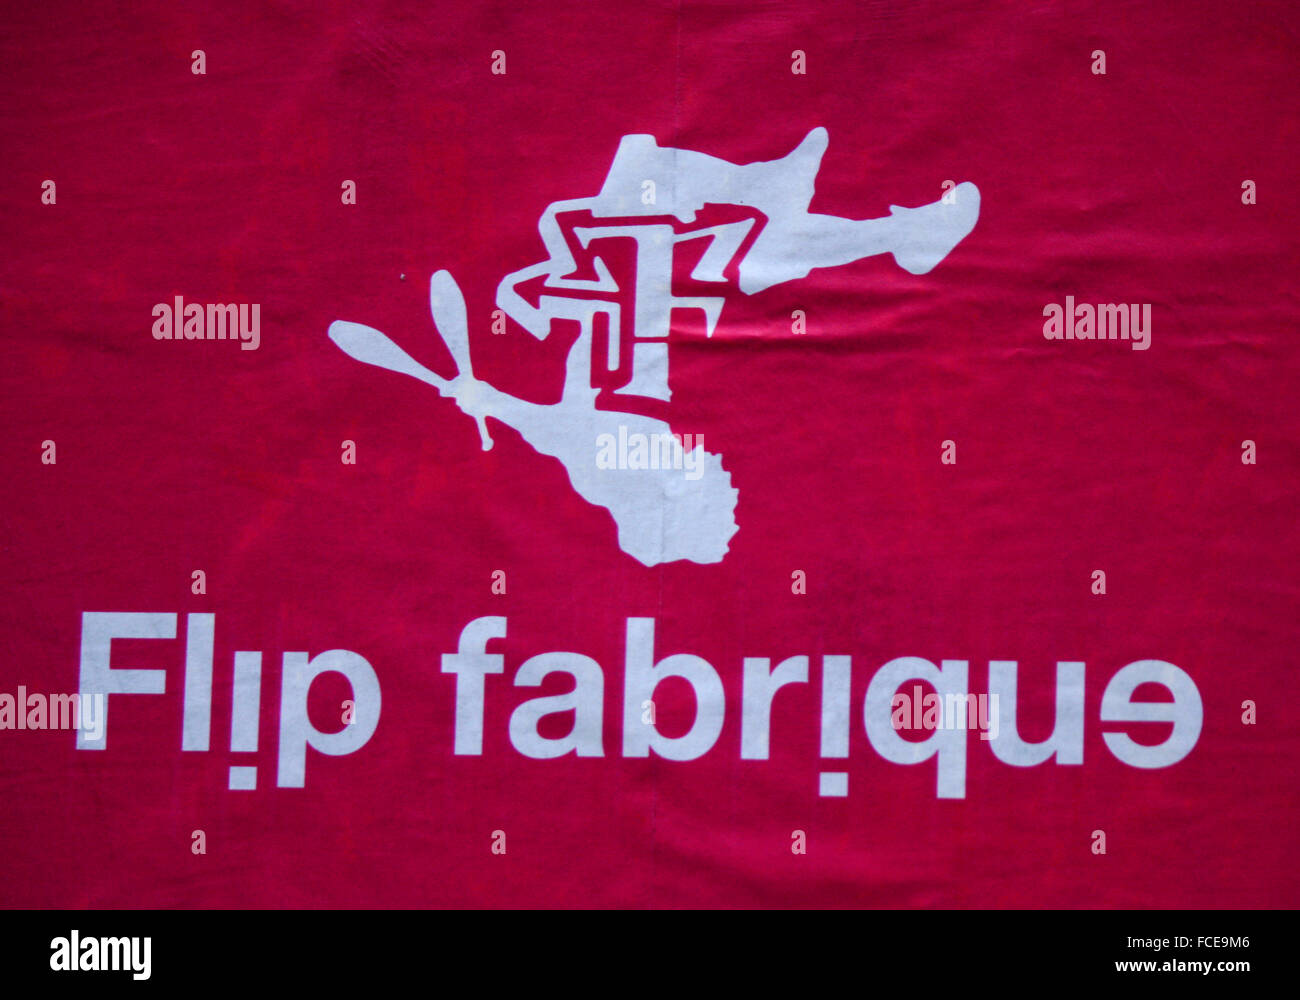 Markenname: 'Flip Fabrique', Berlin. - Stock Image